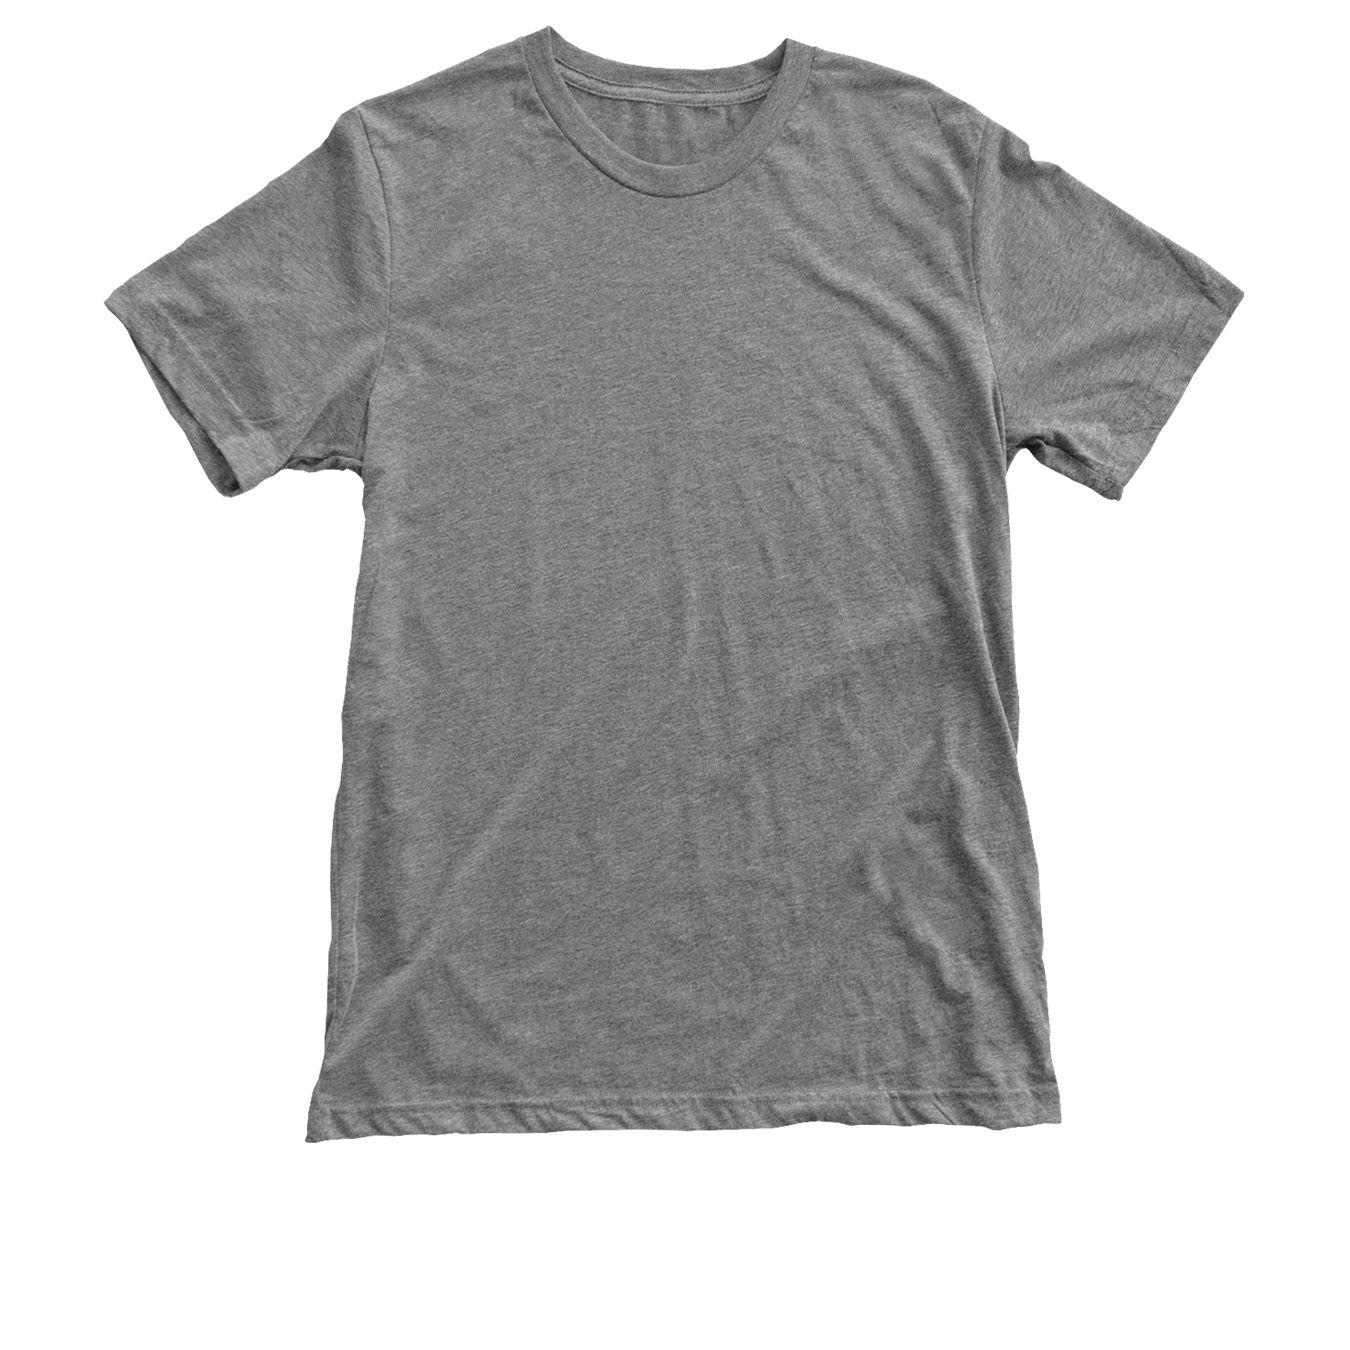 T Shirt Design Tool Make Your Own Shirt Design Bonfire In 2020 Make Your Own Shirt Custom Shirts Online Custom Shirts